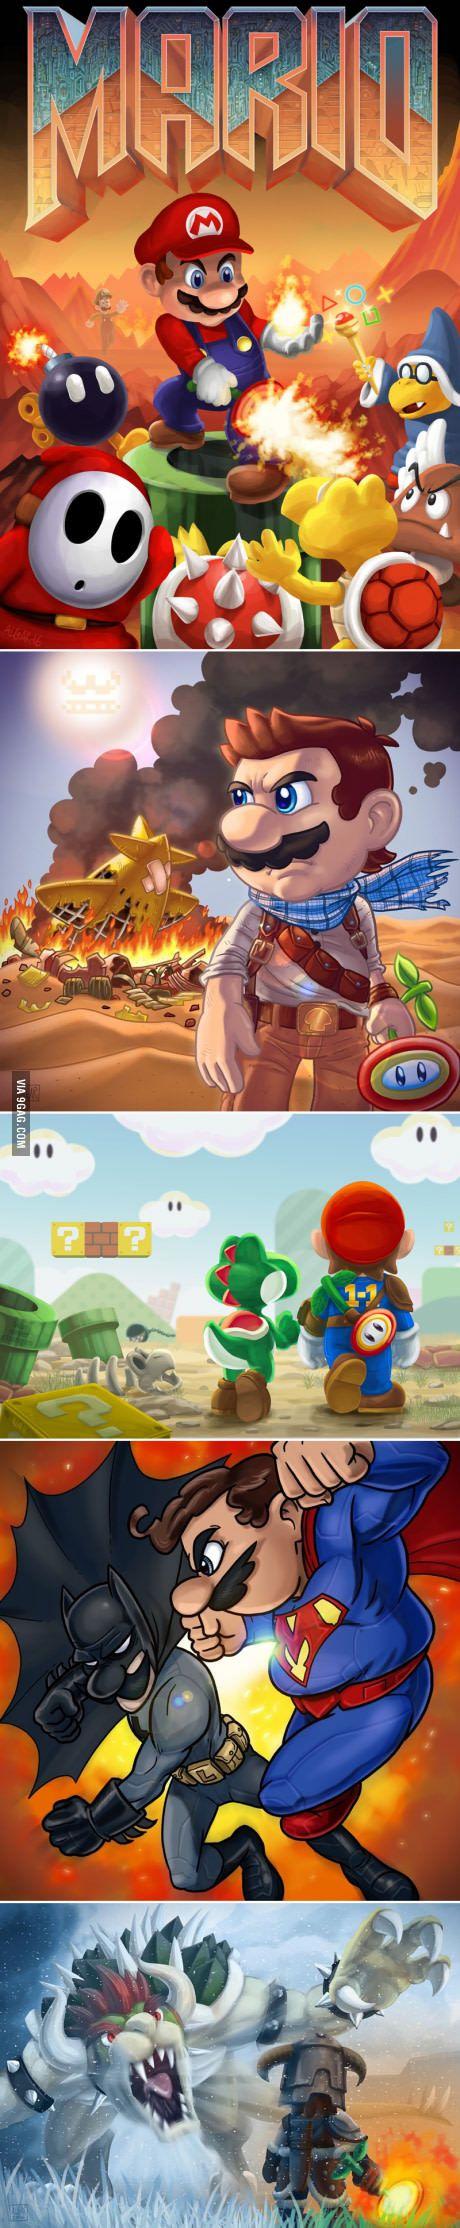 Mario, Mario is everywhere.